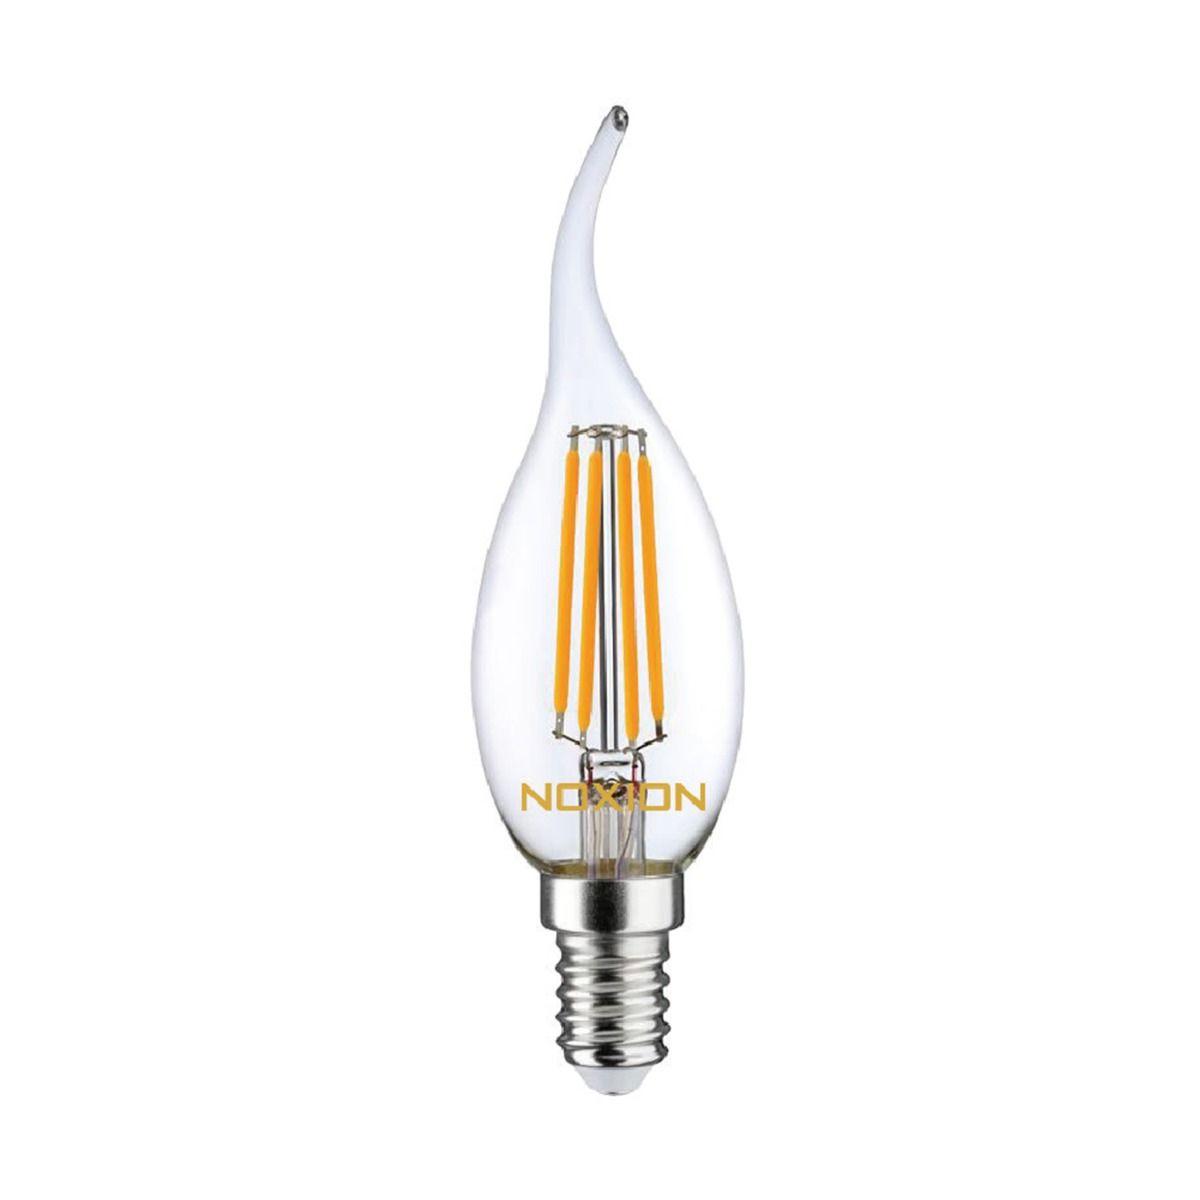 Noxion Lucent Fadenlampe LED Candle 4.5W 827 BA35 E14 Klar   Dimmbar - Ersatz für 40W